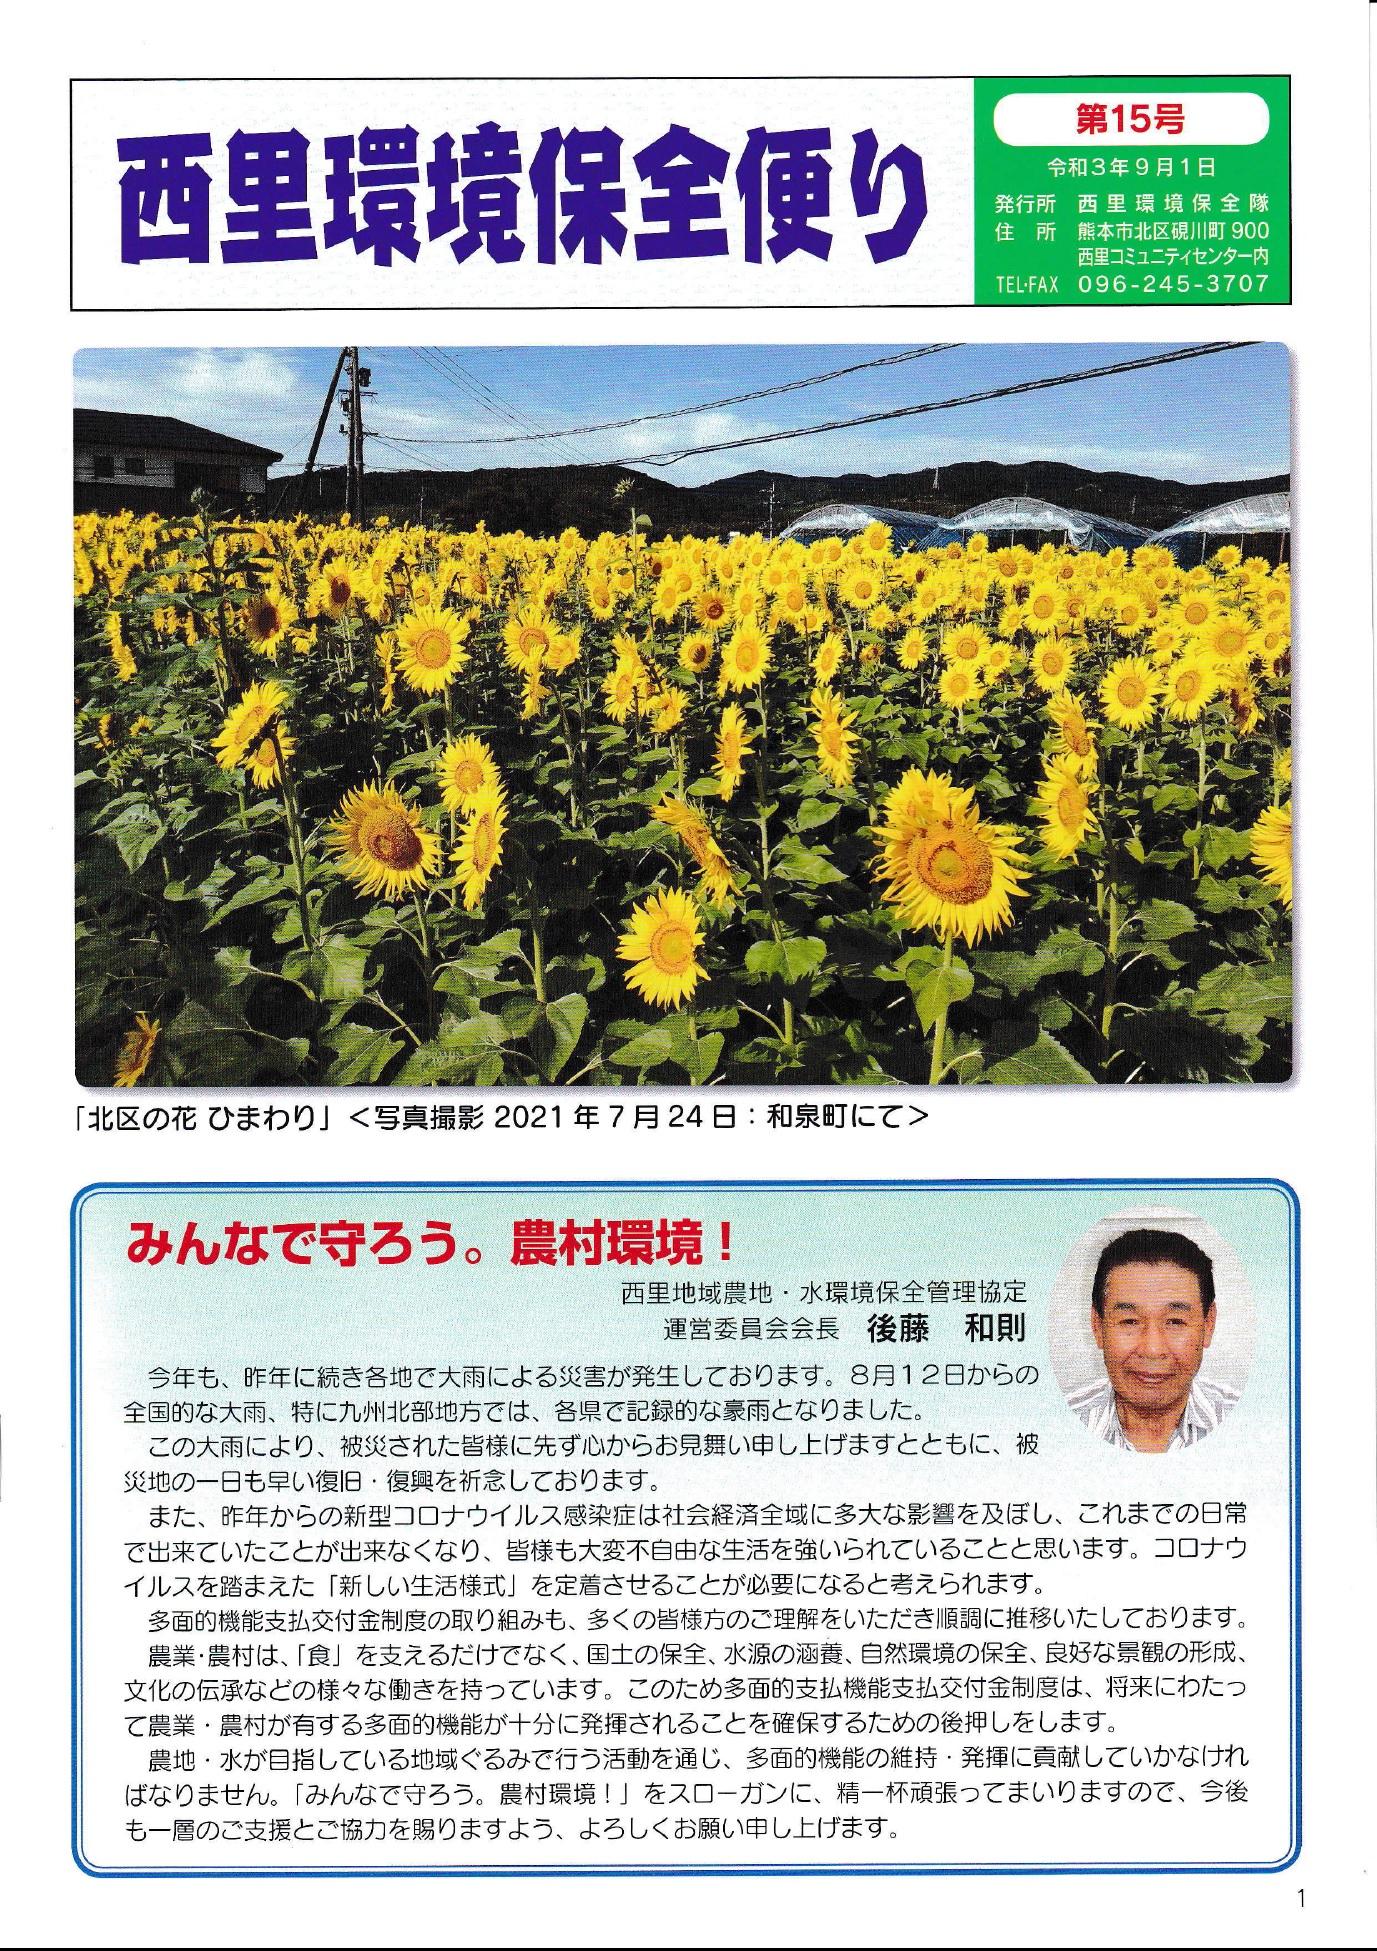 西里環境保全便り(令和3年9月1日発行)